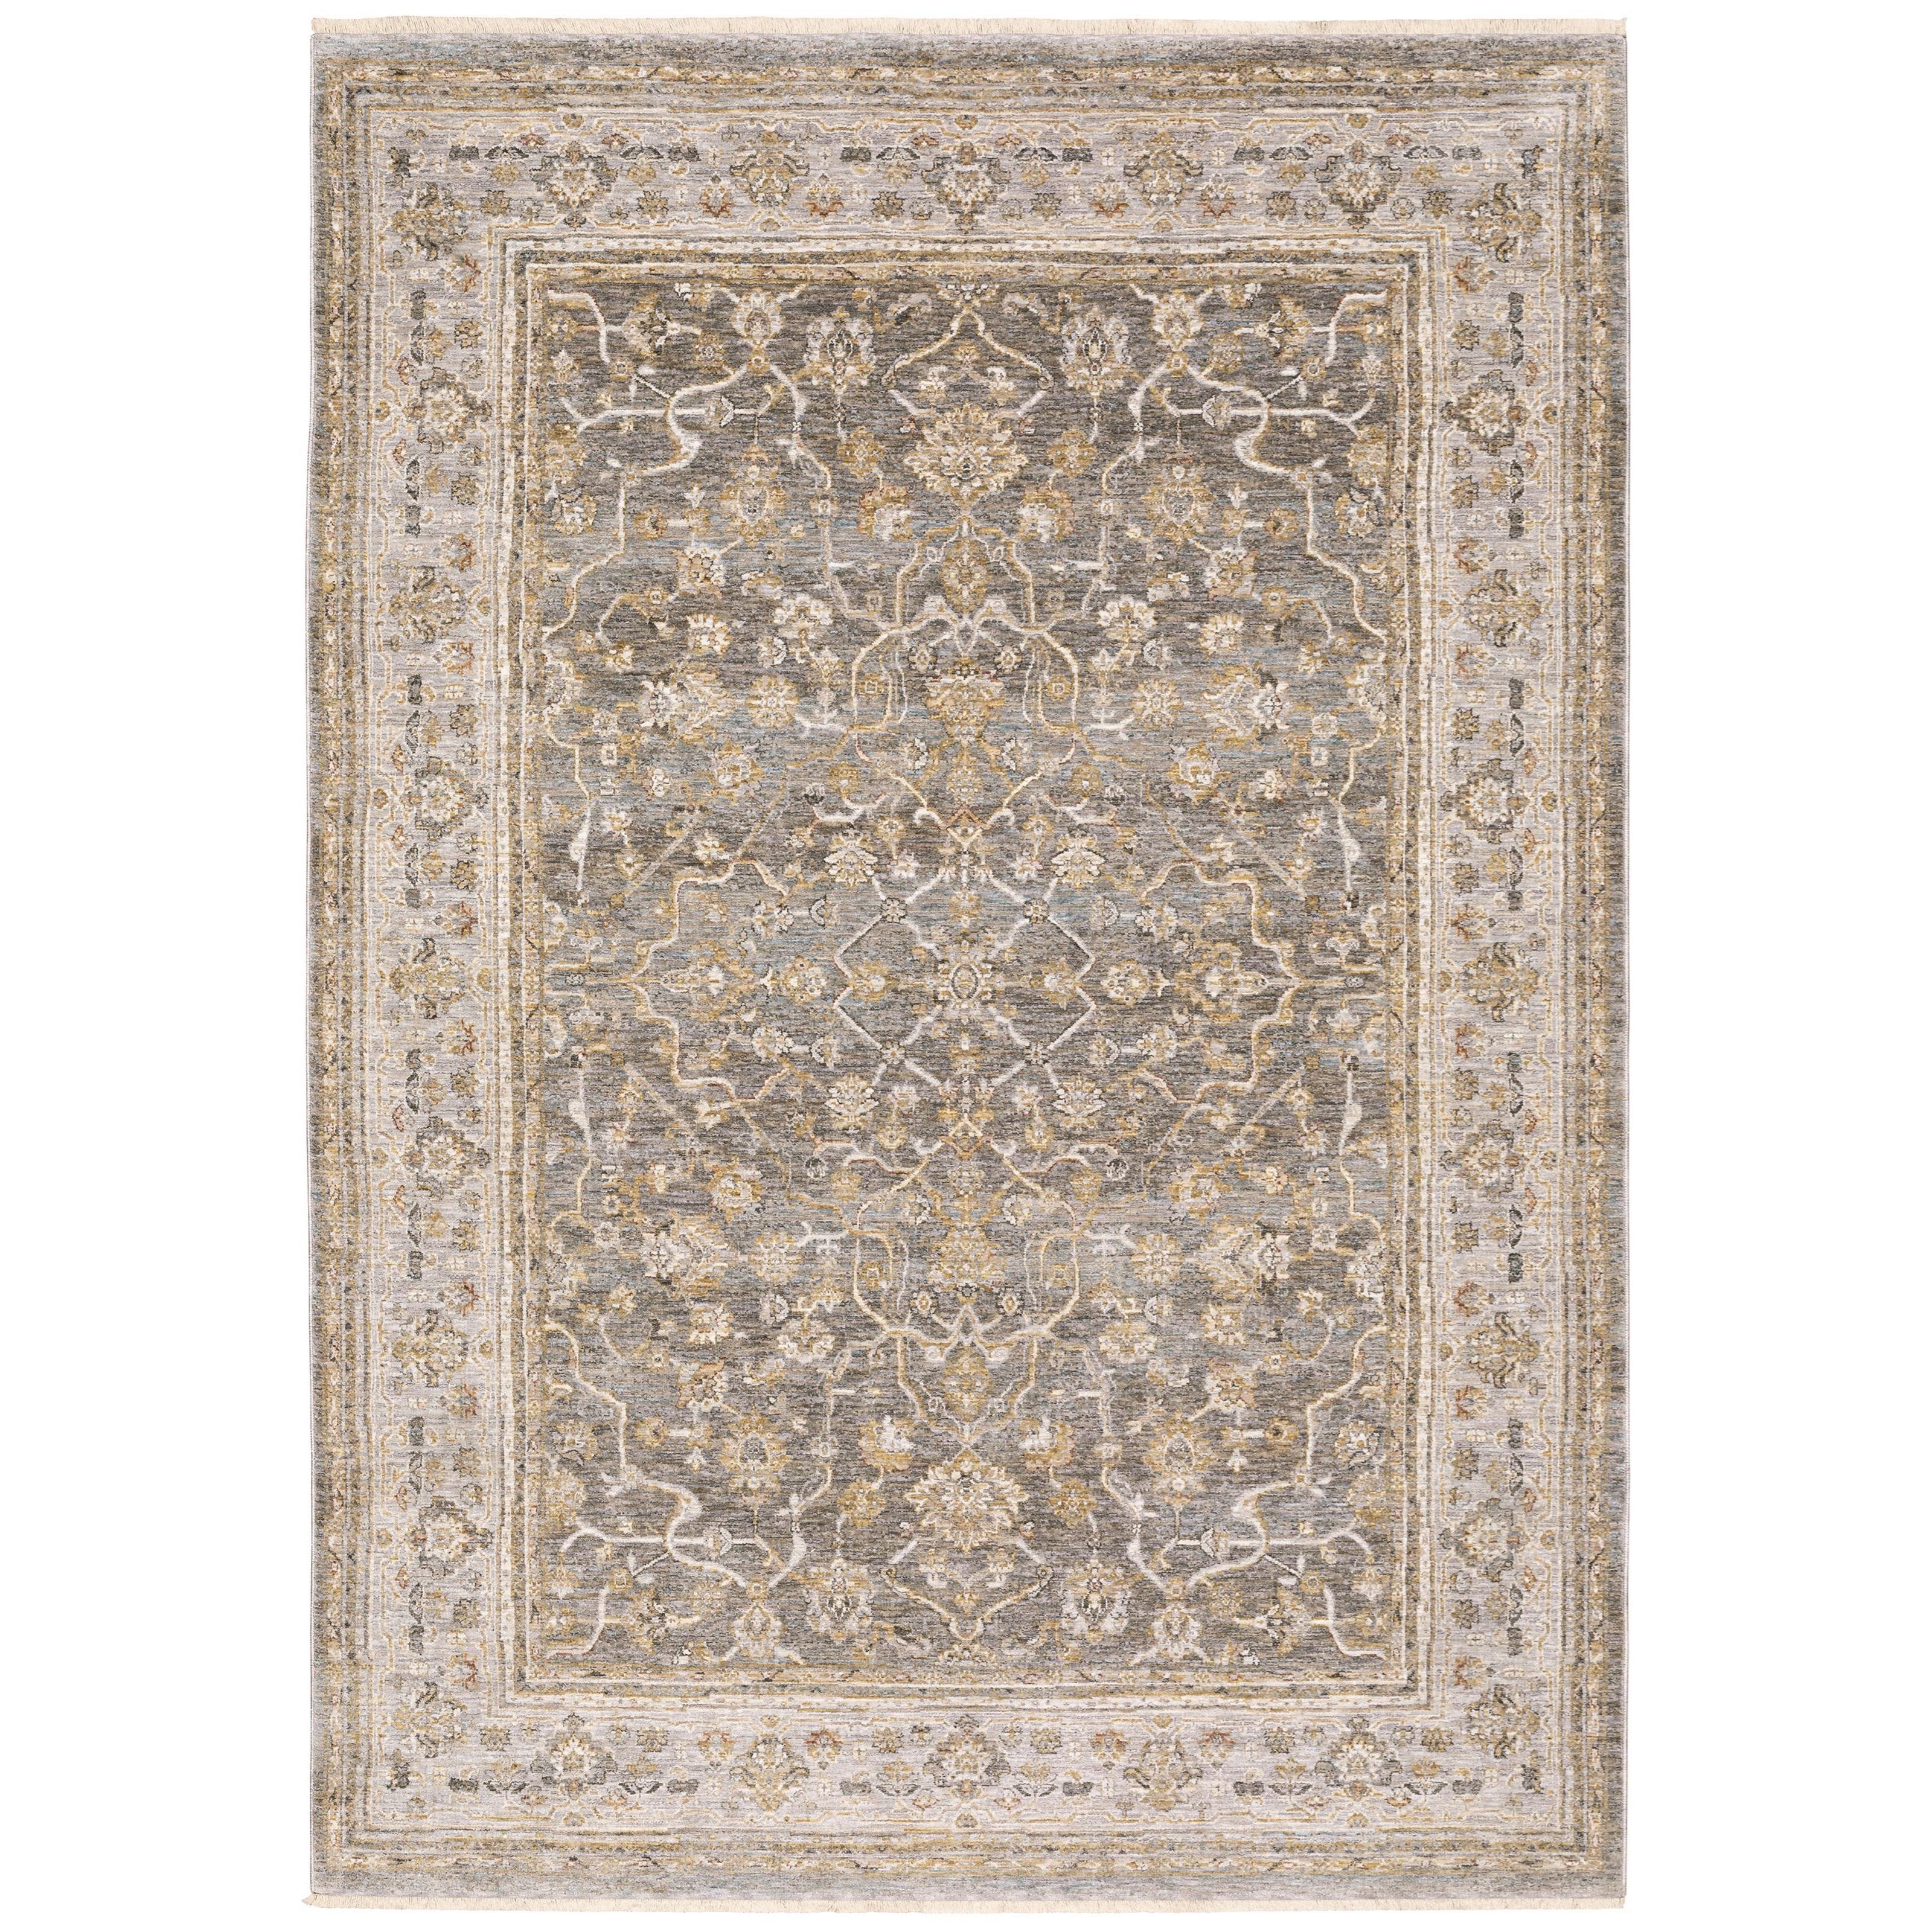 "Maharaja 9'10"" X 12'10"" Rectangle Rug by Oriental Weavers at Lucas Furniture & Mattress"